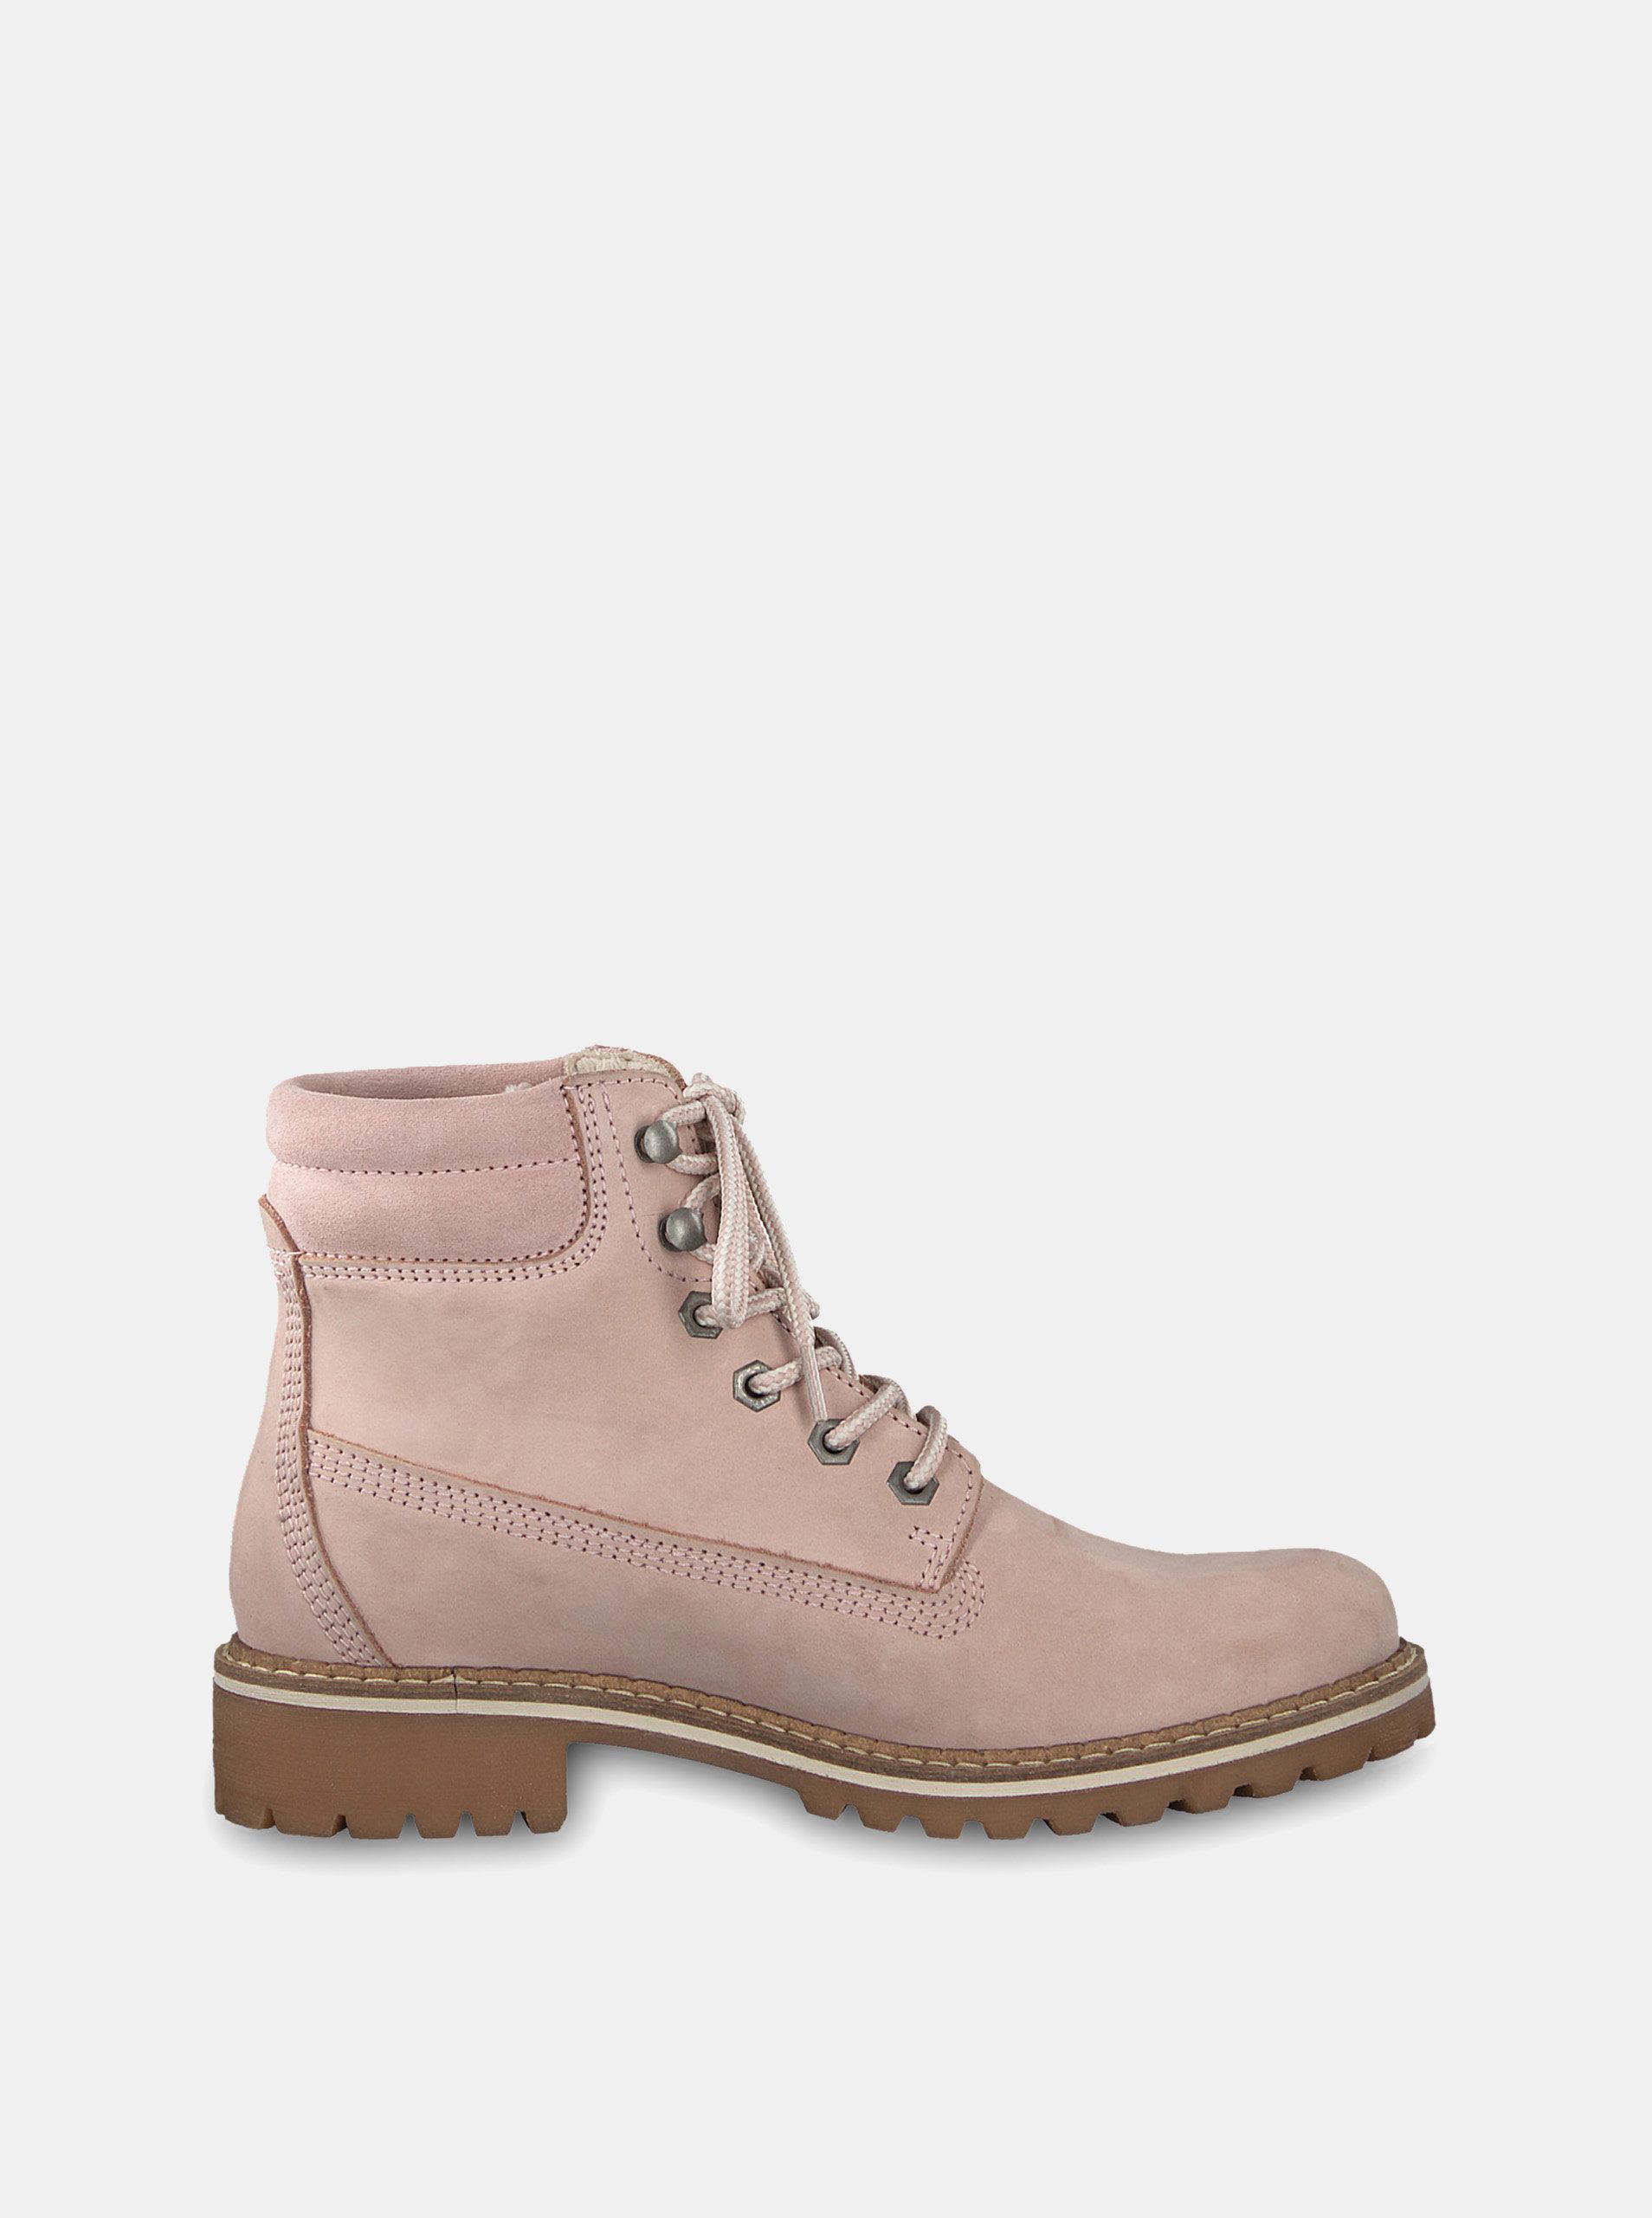 9af3c175af6f Svetloružové semišové členkové topánky Tamaris ...